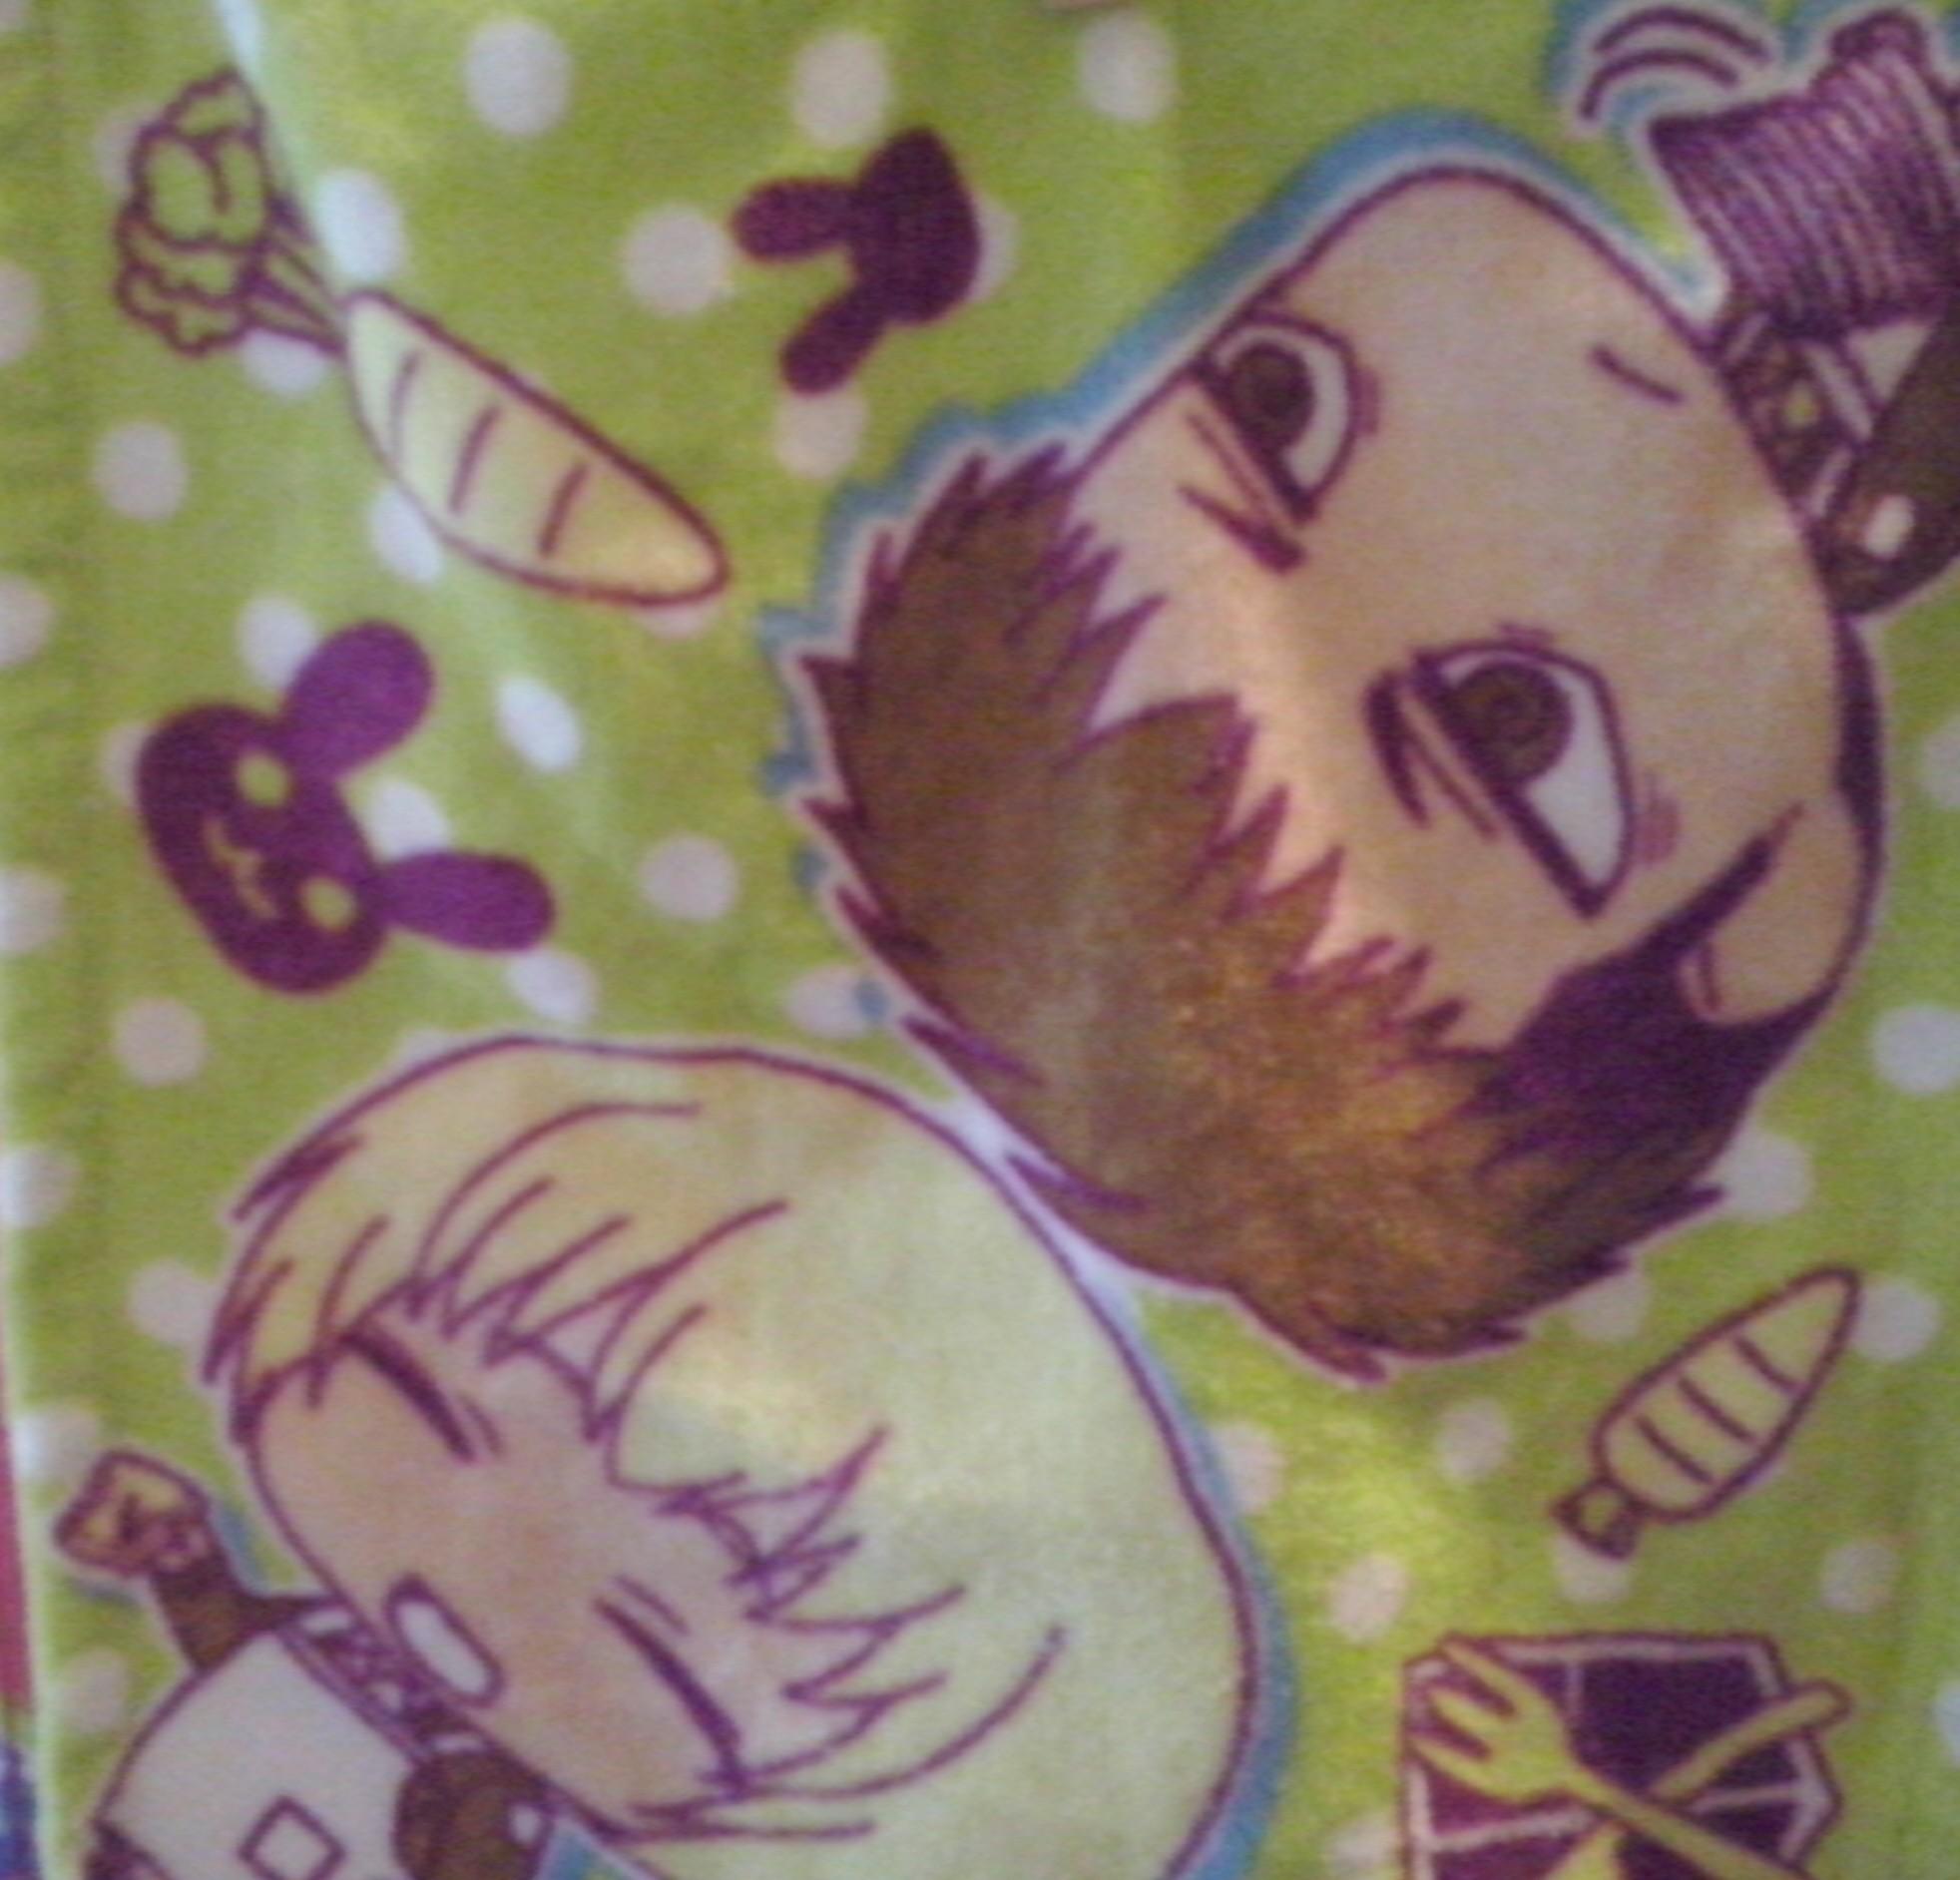 banpresto chimi ichiban_kuji mini_towel kodansha chimi_chara shingeki_no_kyojin isayama_hajime jean_kirstein armin_arlert ichiban_kuji_shingeki_no_kyojin_~_tobe!_chousa_heidan!!_~